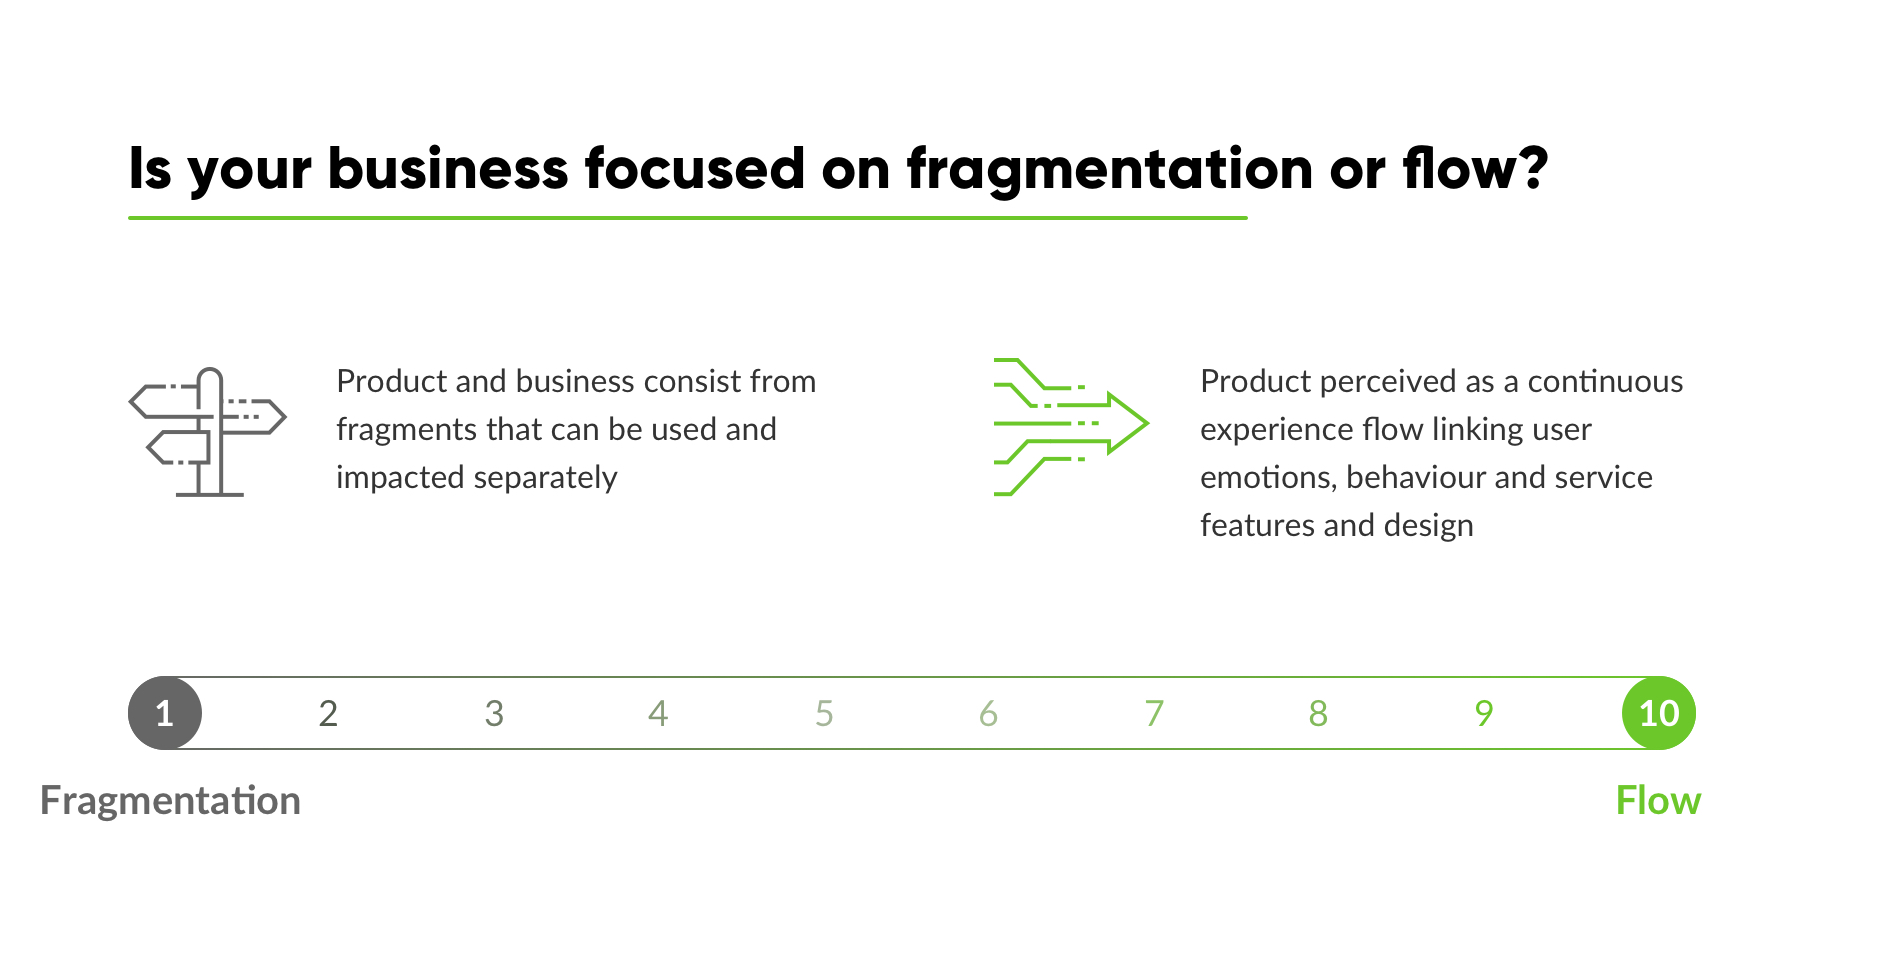 fragmentation-flow-experience-mindset-article-new.jpg